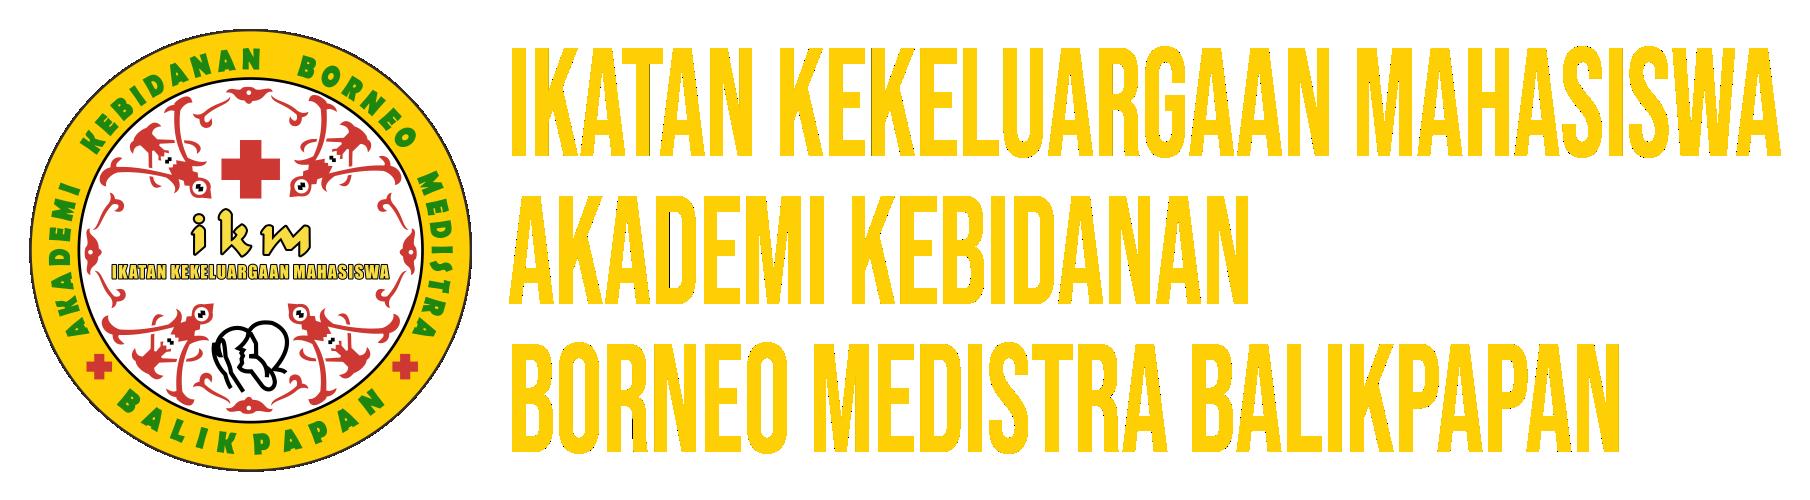 IKM Akademi Kebidanan Borneo Medistra Balikpapan